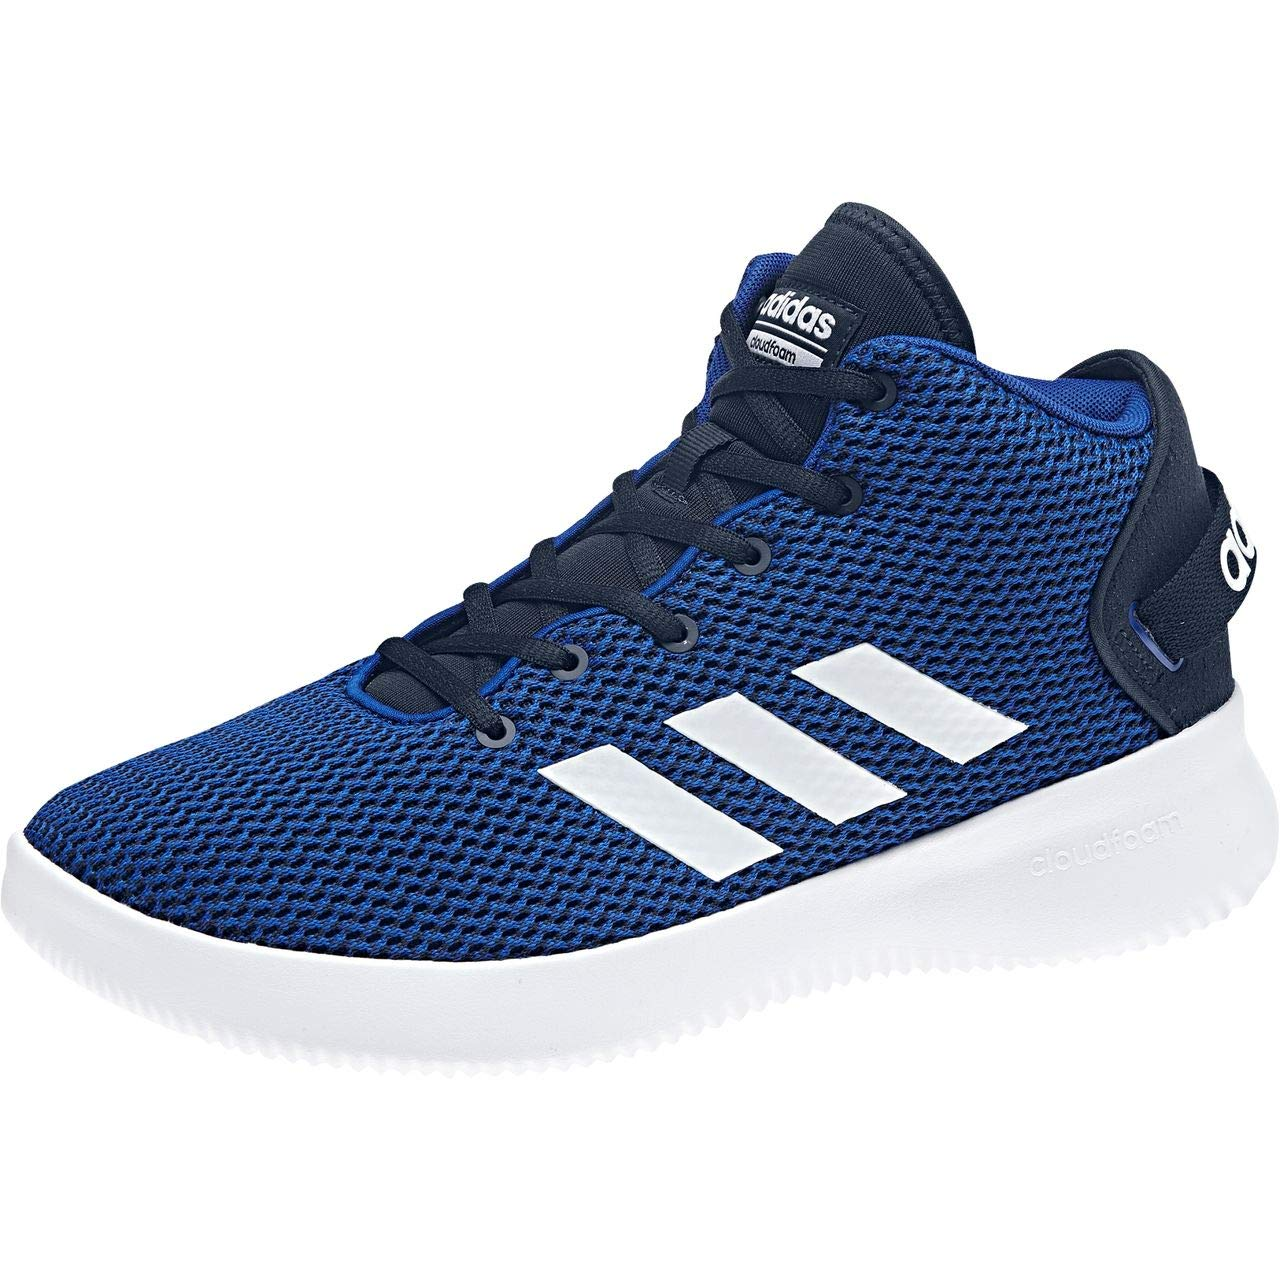 Bleu (Collegiate Navy Footwear blanc Collegiate Royal) adidas Cloudfoam Refresh Mid, Baskets Hautes Homme 44 2 3 EU